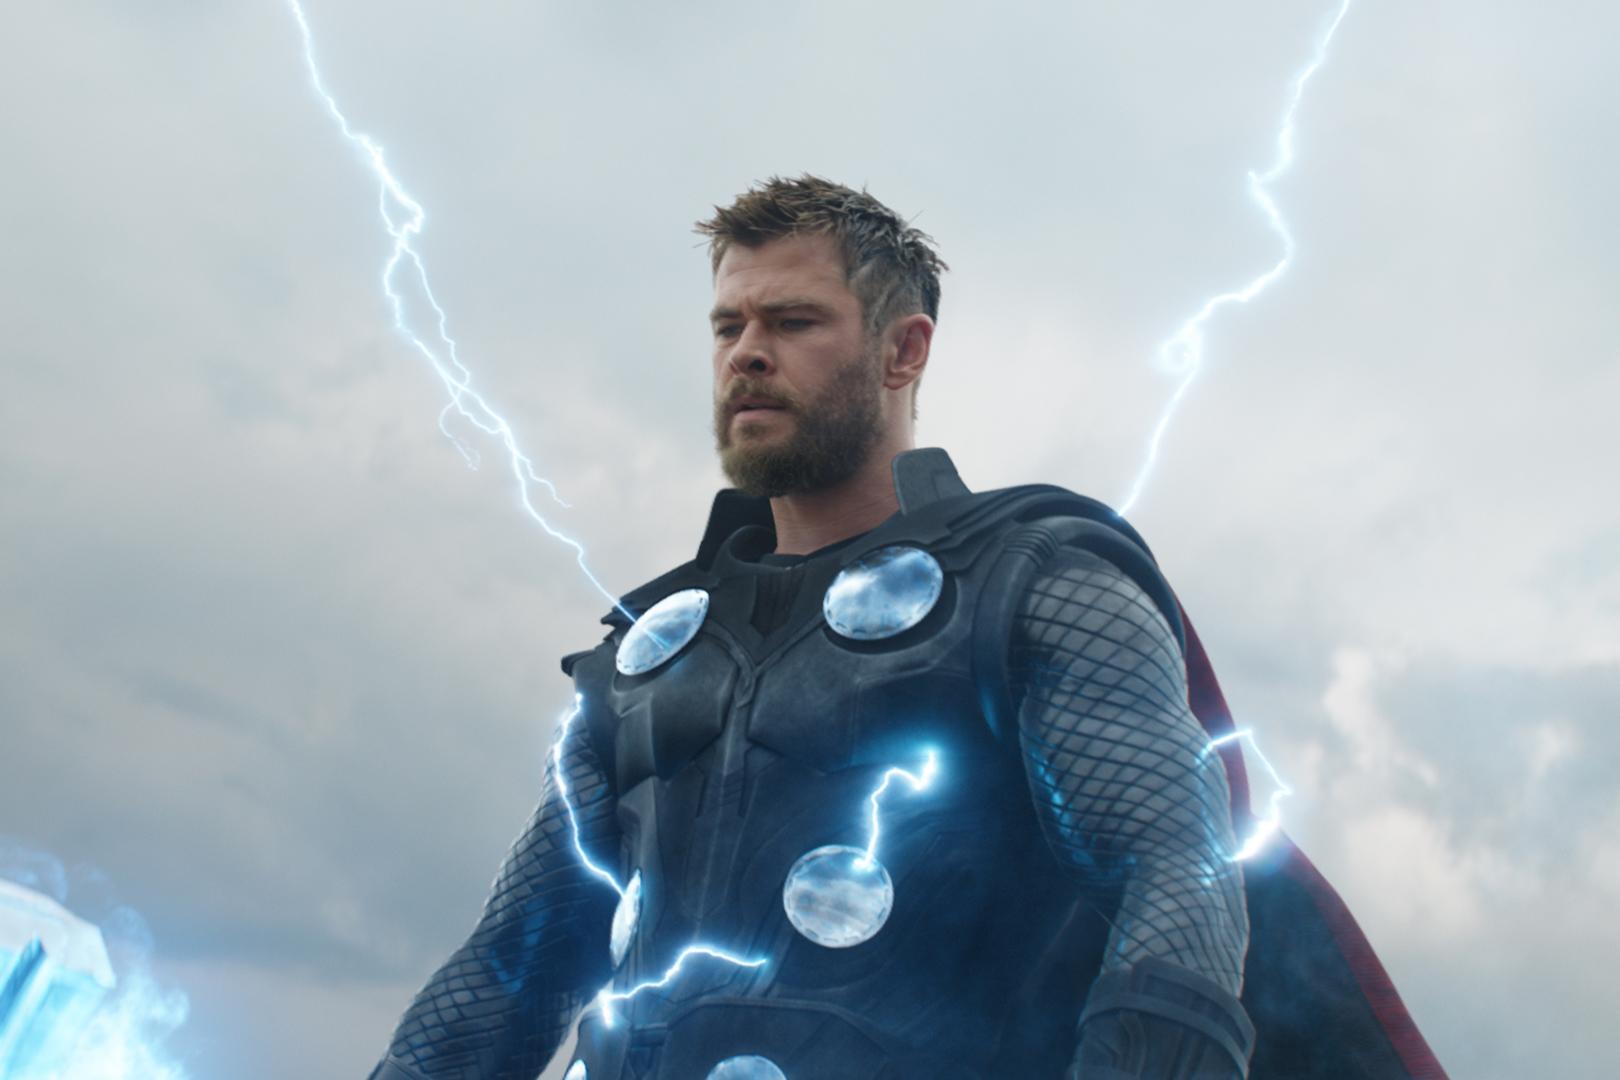 Australian actor Chris Hemsworth stars as the hammer-wielding Thor in